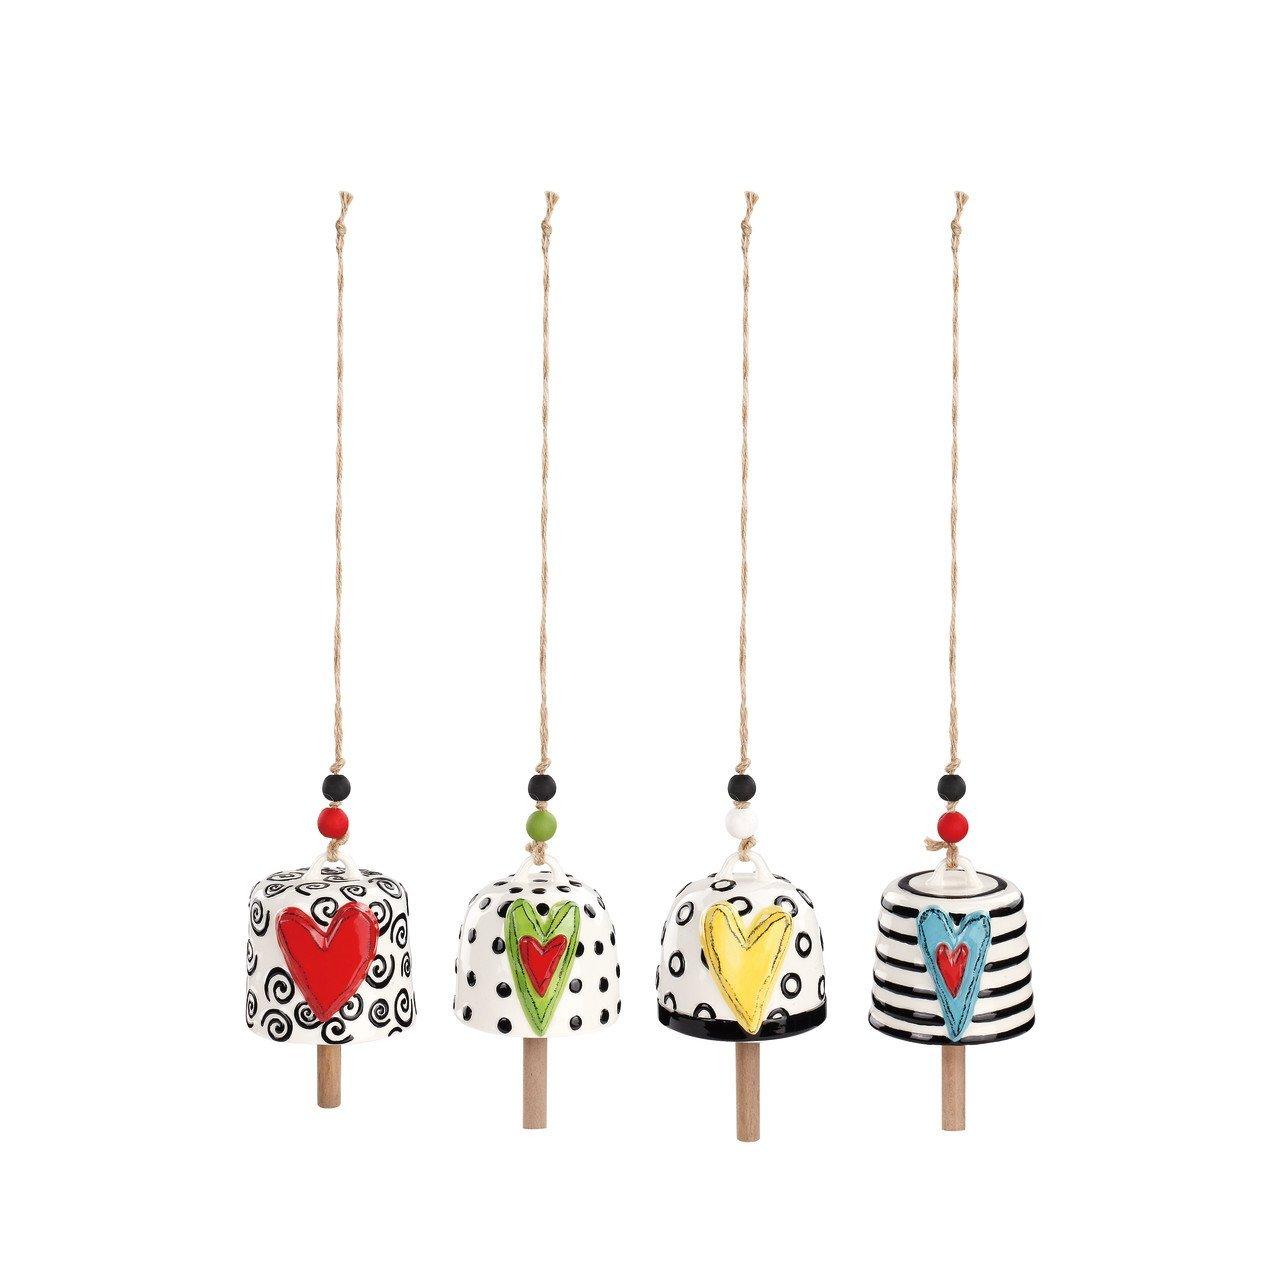 DEMDACO Assorted Heart Multicolored 7 x 4 Ceramic Stoneware Decorative Bells Set of 4